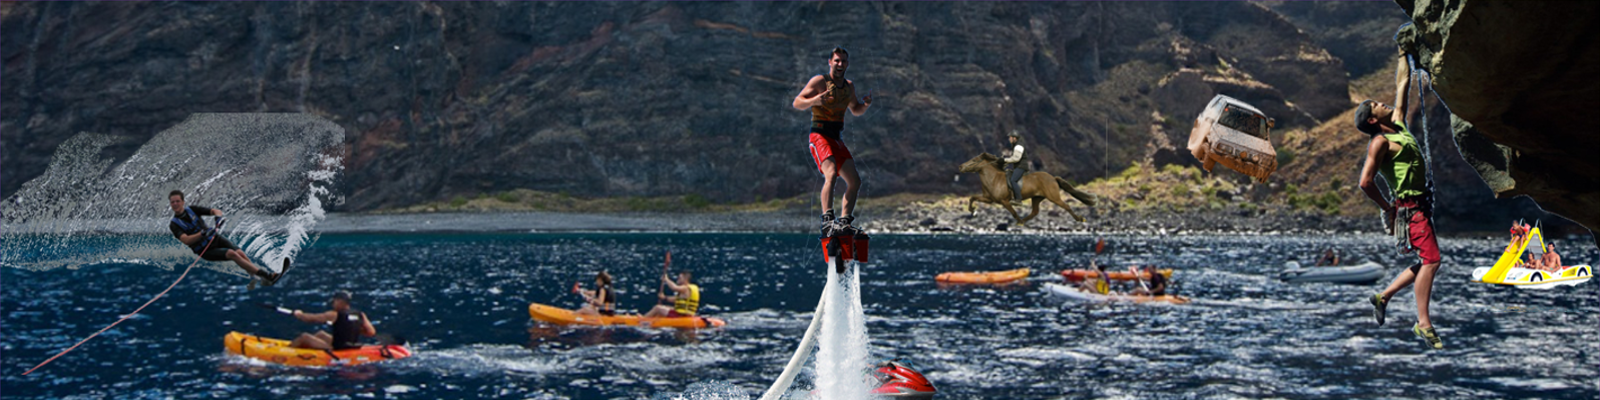 Find all sorts of adventure activities